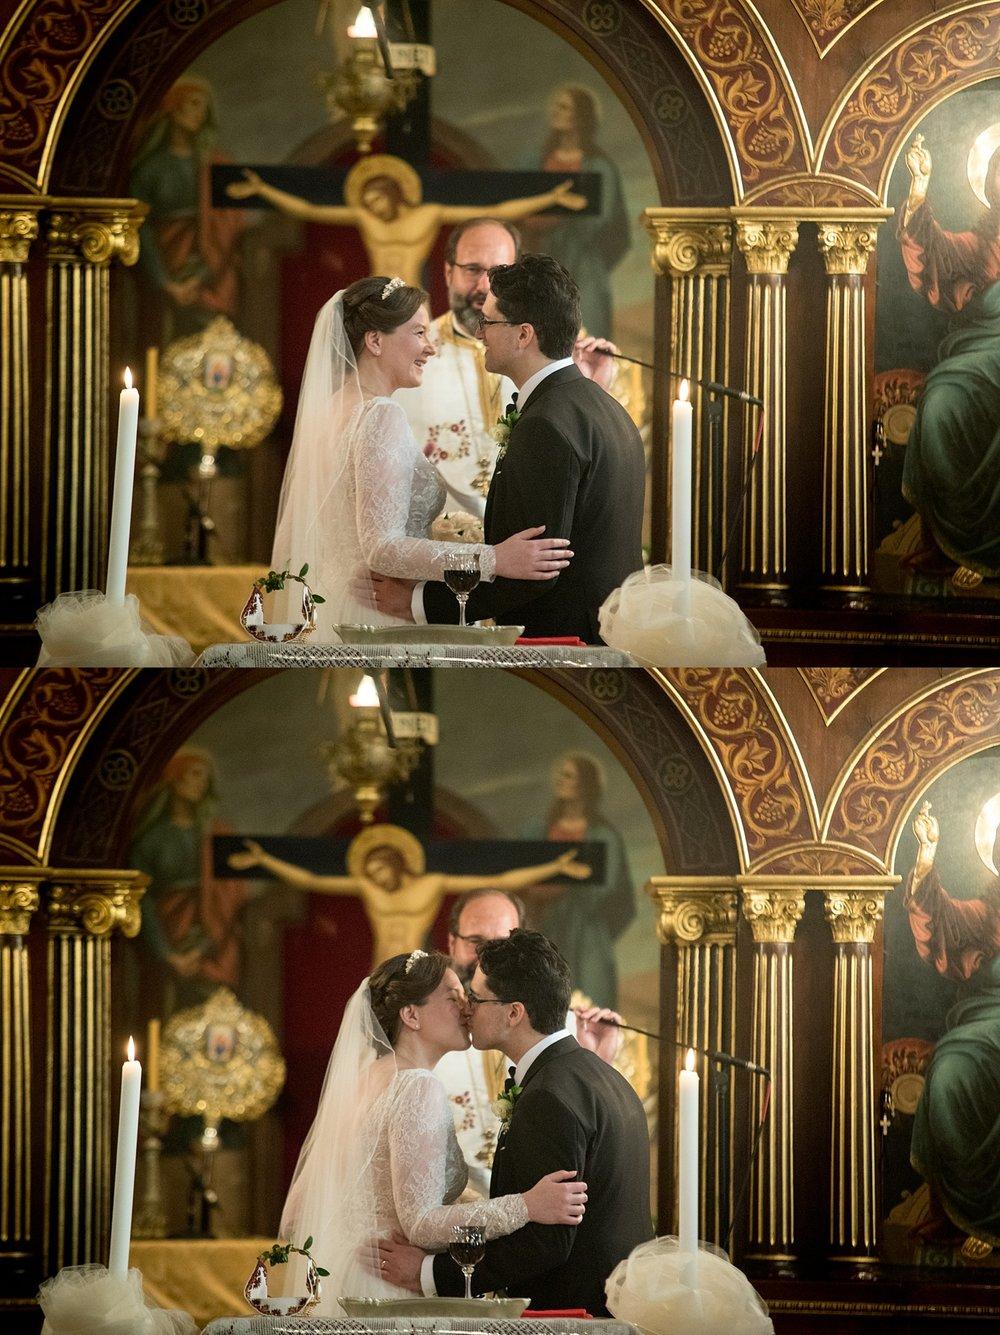 philadelphia wedding photography cherie_0029.jpg